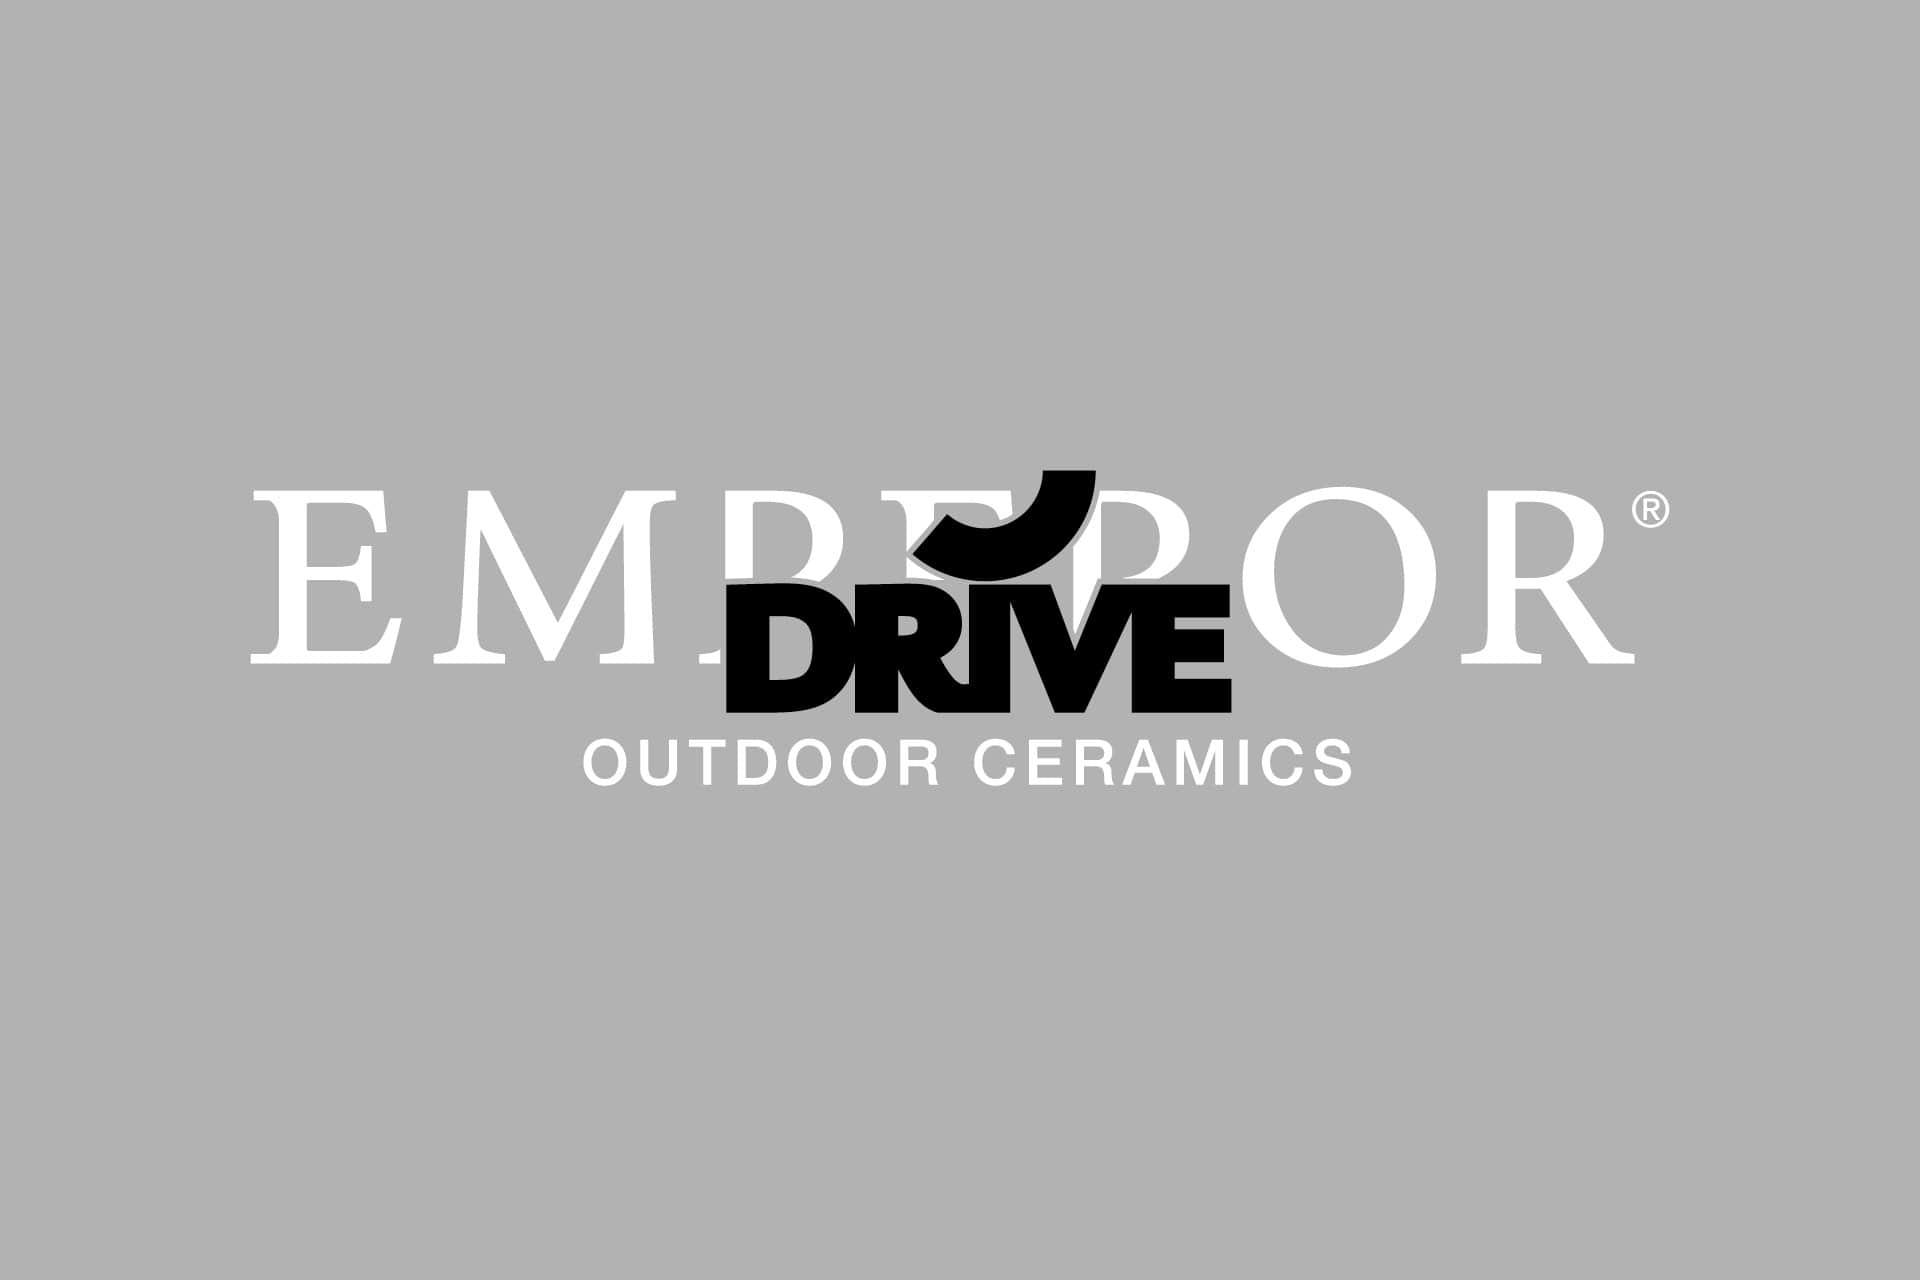 Emperor Drive outdoor caramics logo